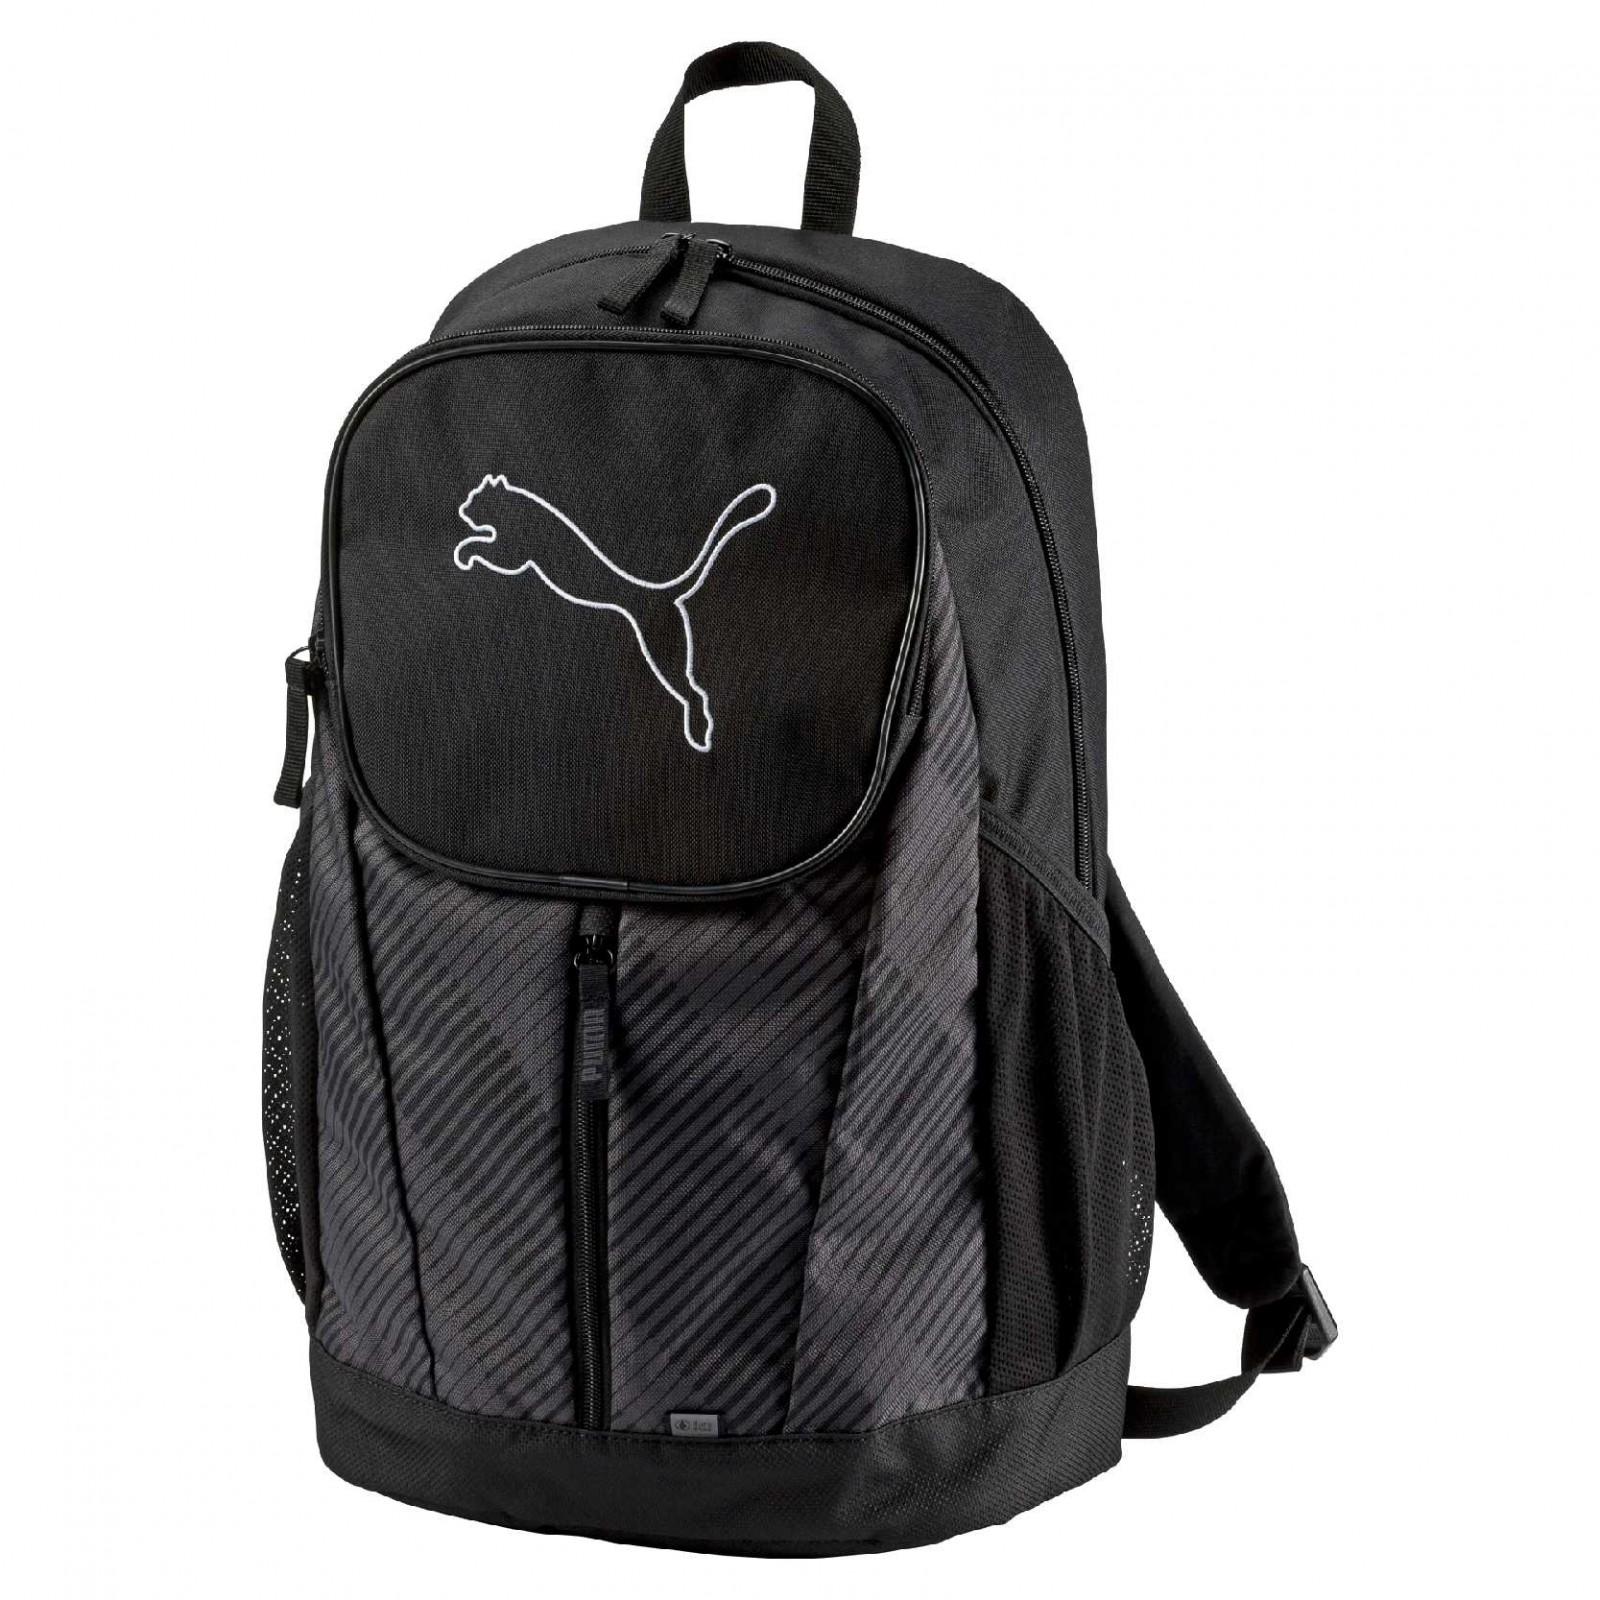 9ebaf8190b6 Pánský batoh Puma Echo Backpack